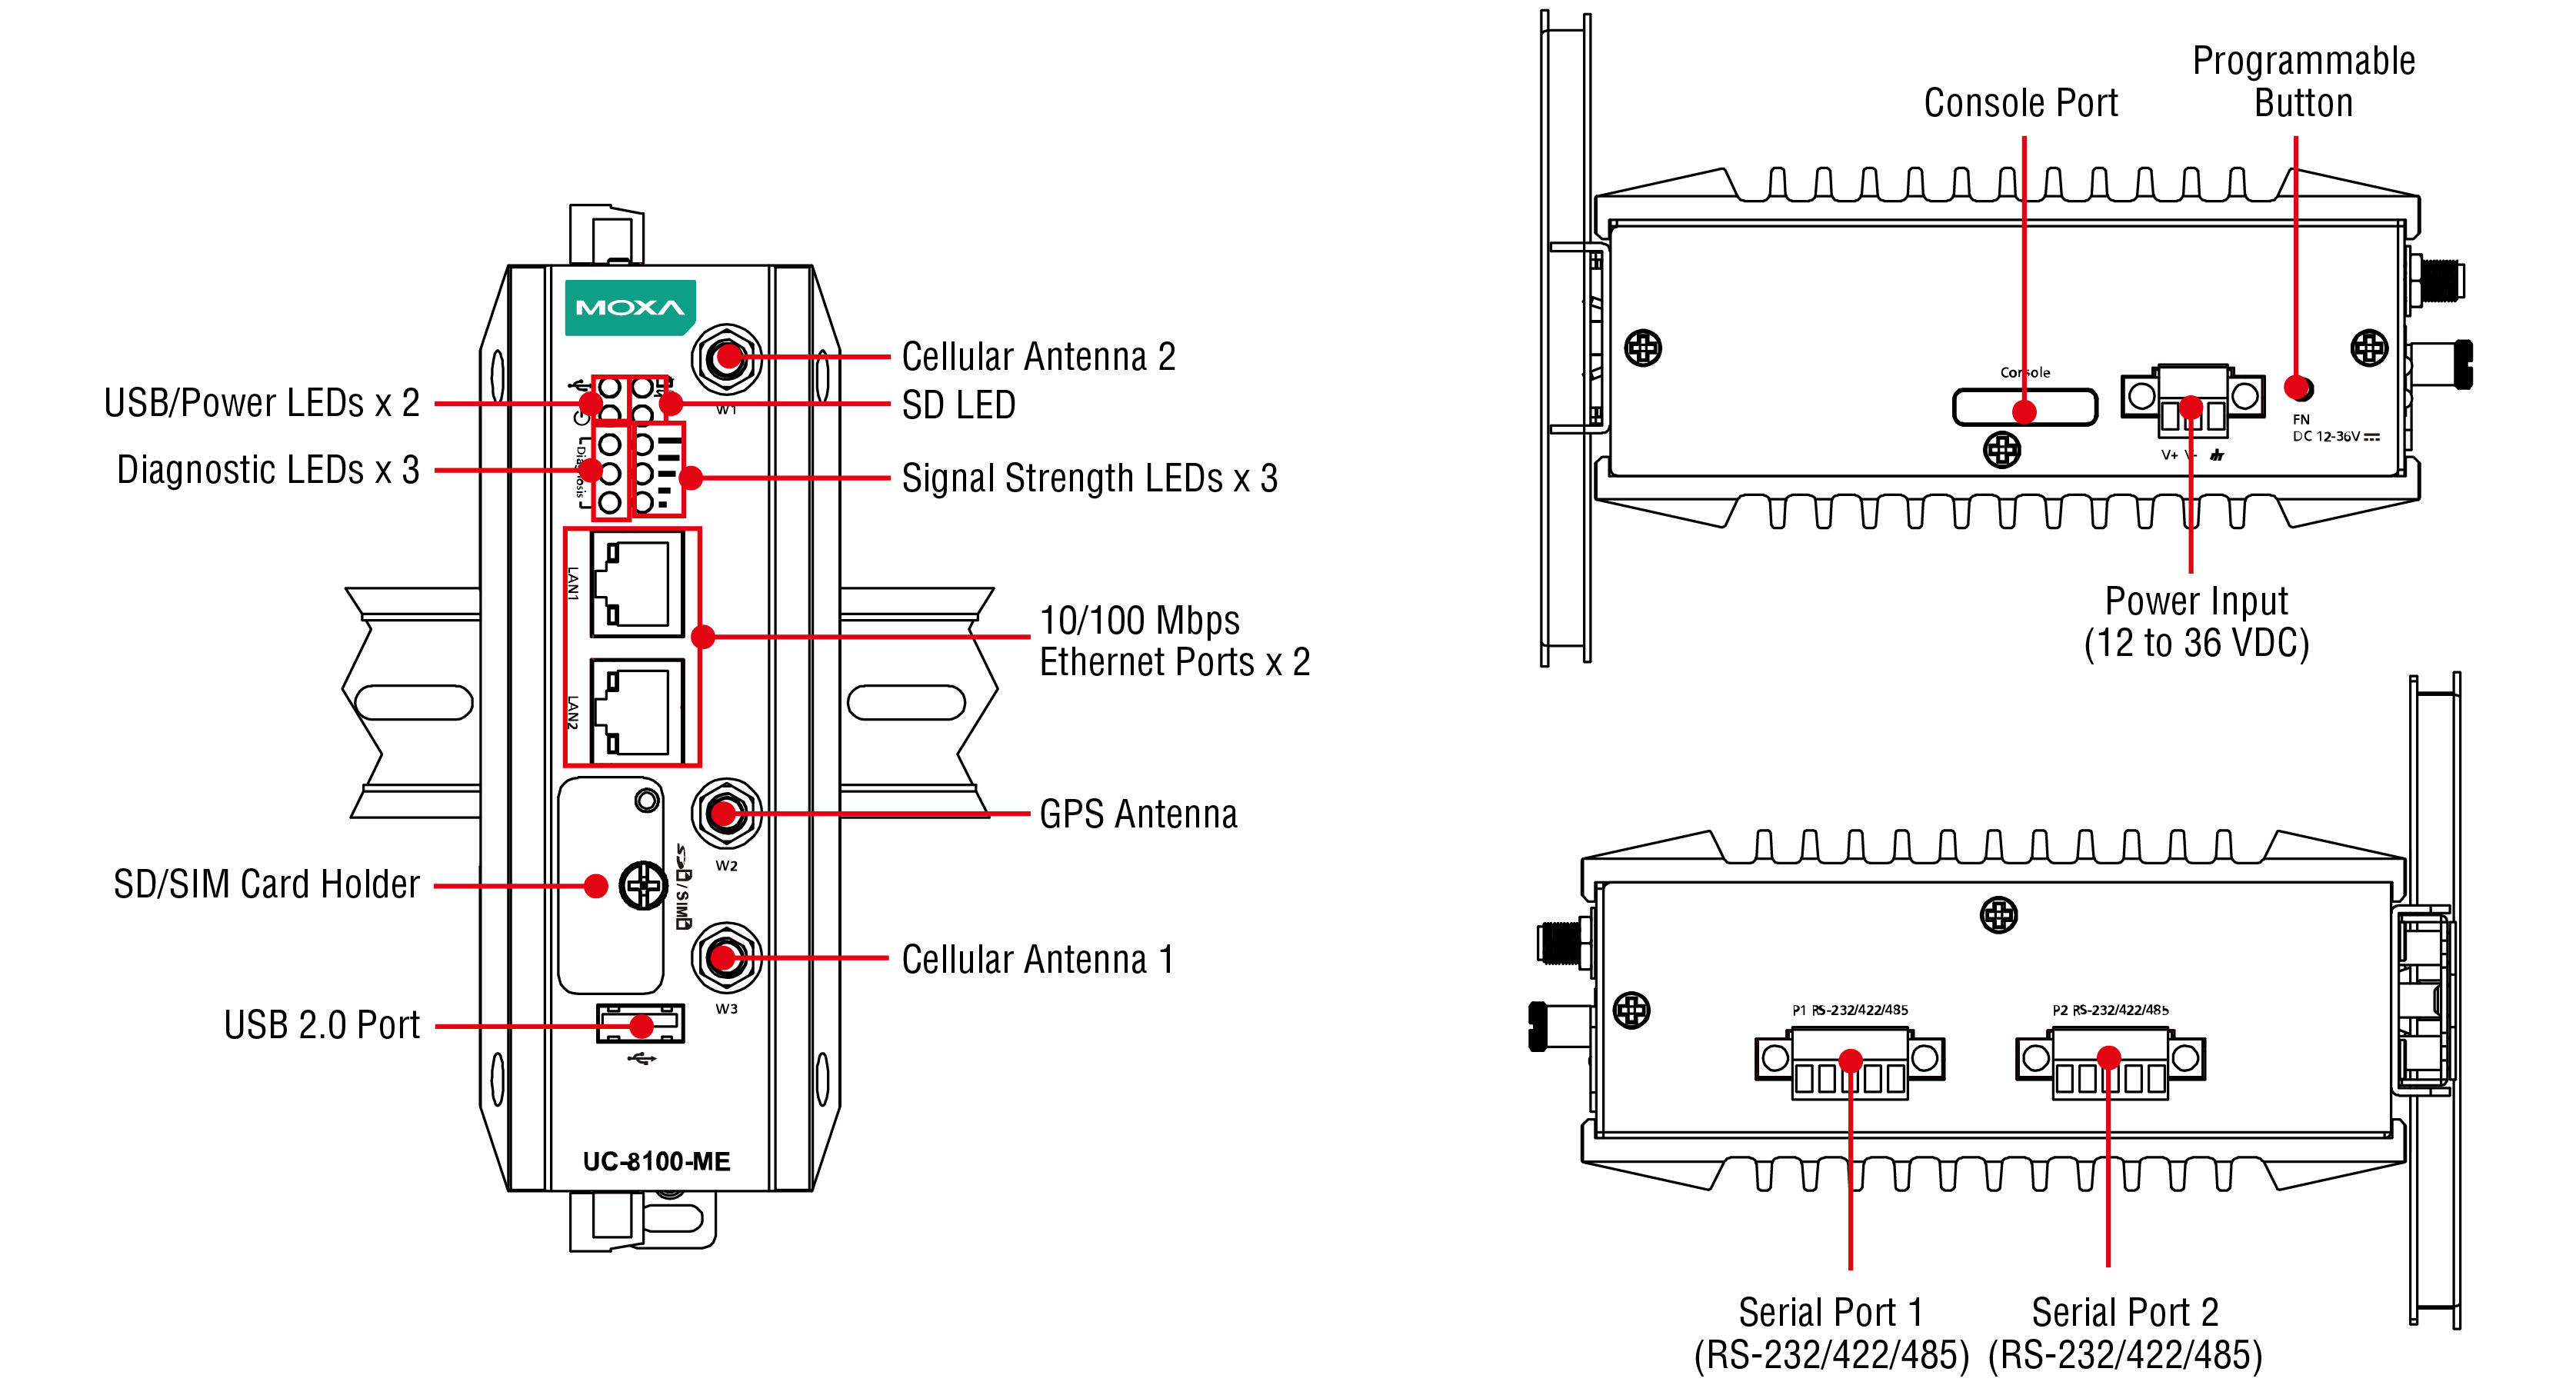 UC-8100-ME-T Series - Arm-Based Computers | MOXA